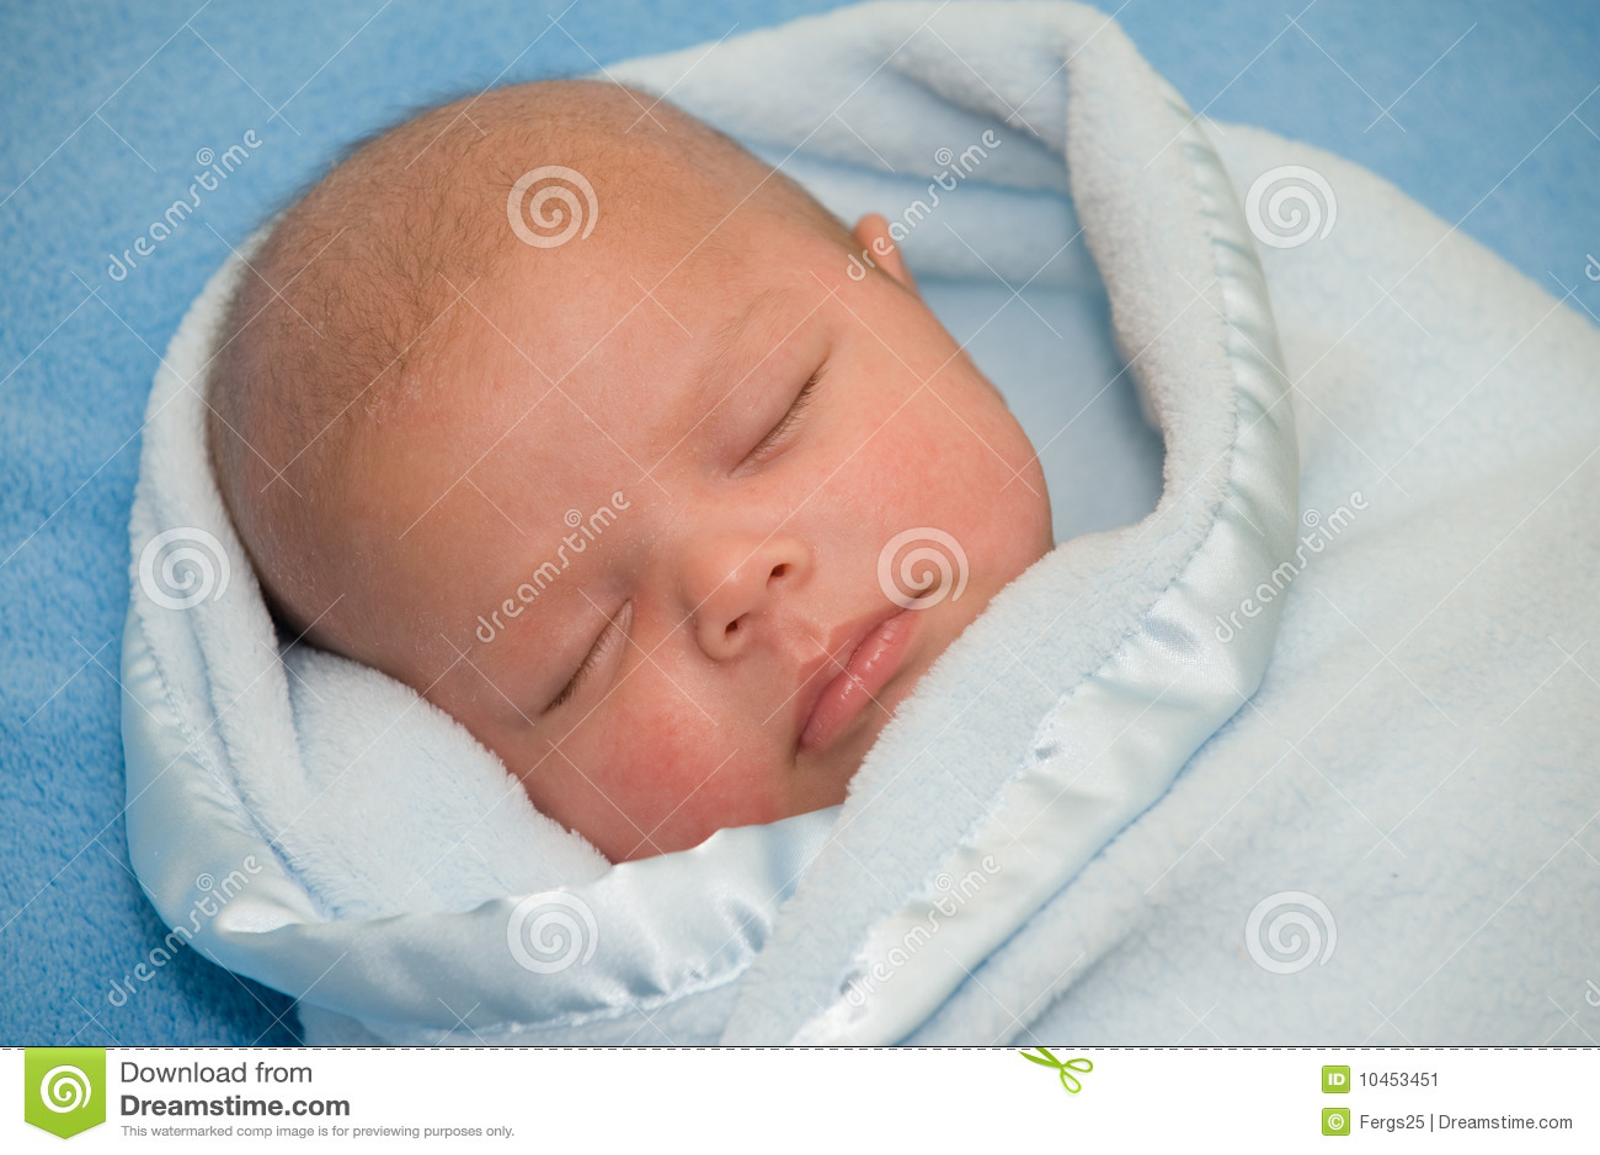 a newborn baby boy